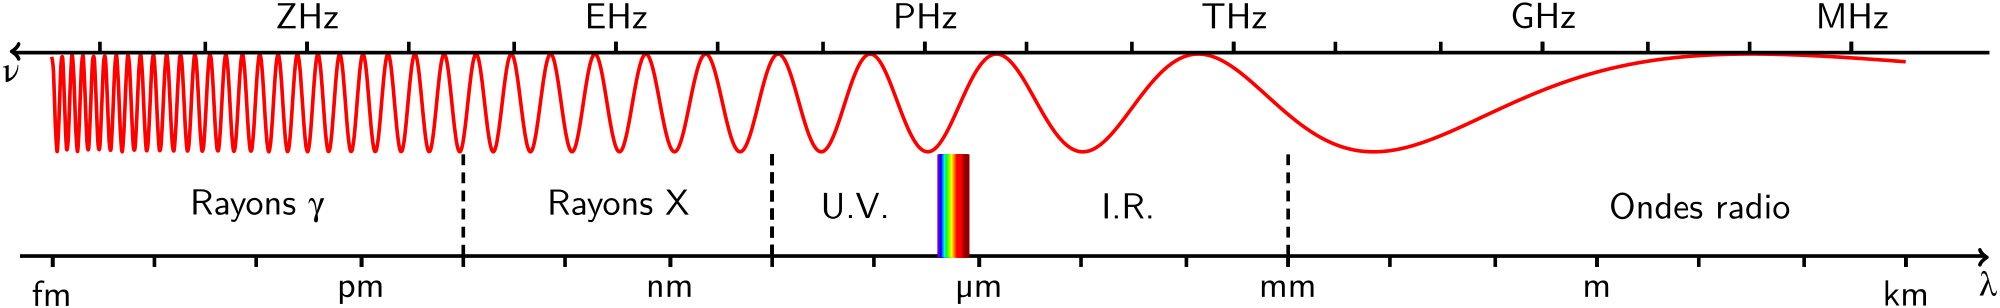 spectre-radio (Wikipedia)